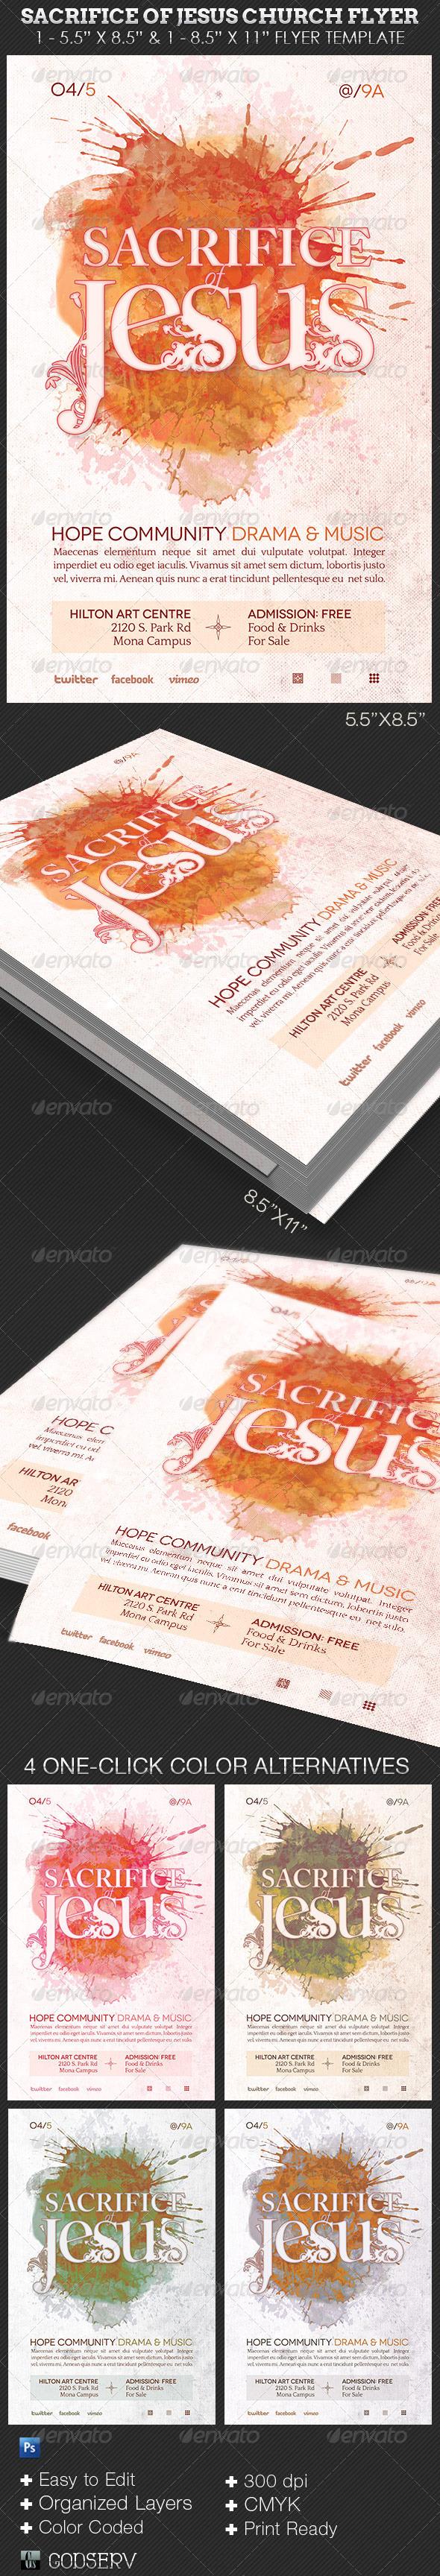 Sacrifice of Jesus Church Flyer Template - Church Flyers